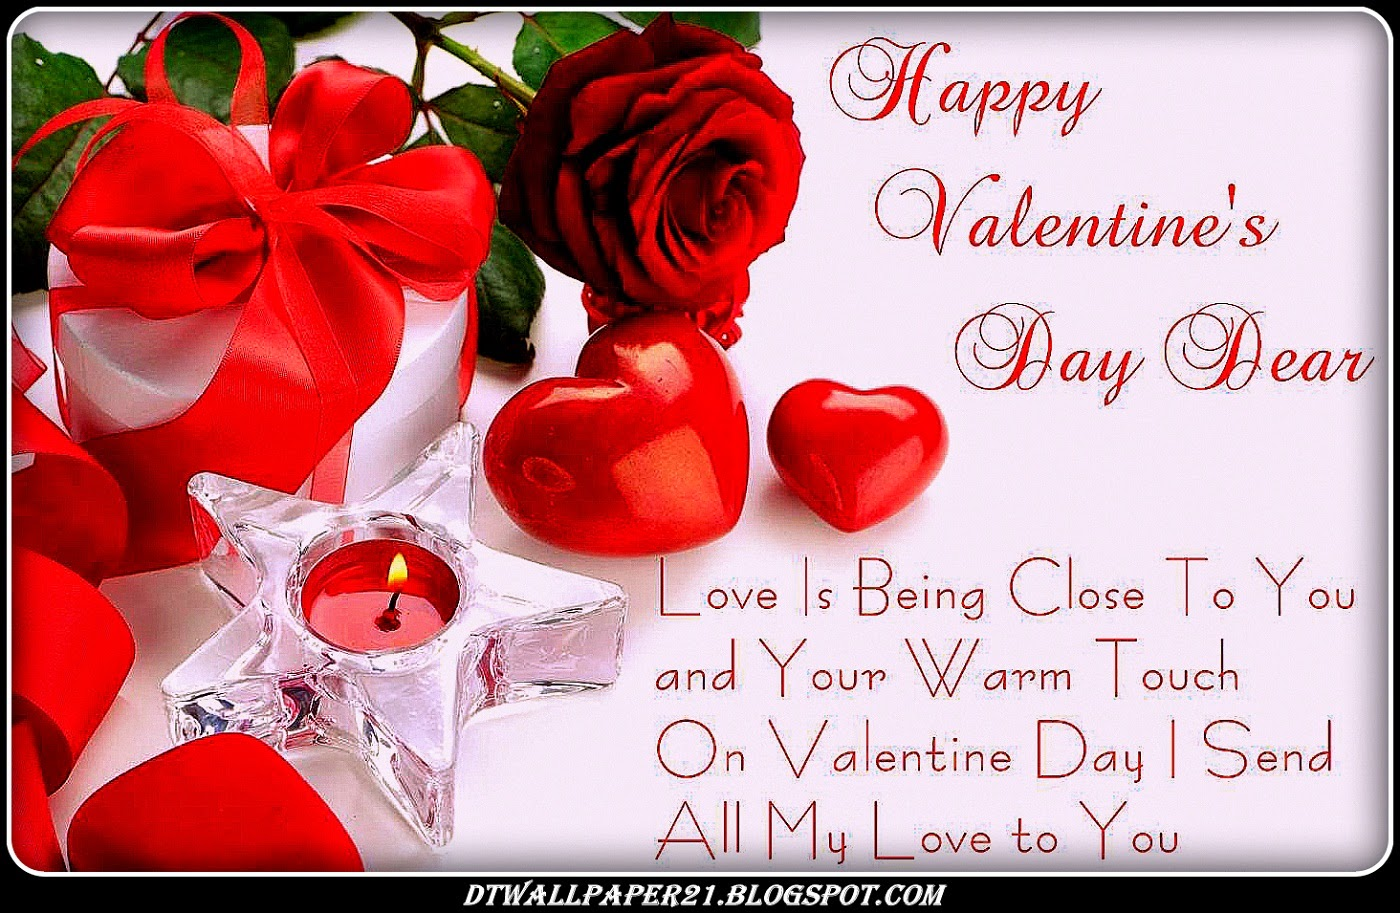 Short Valentines Day Quotes For Friends : Desktop wallpaper background screensavers unique